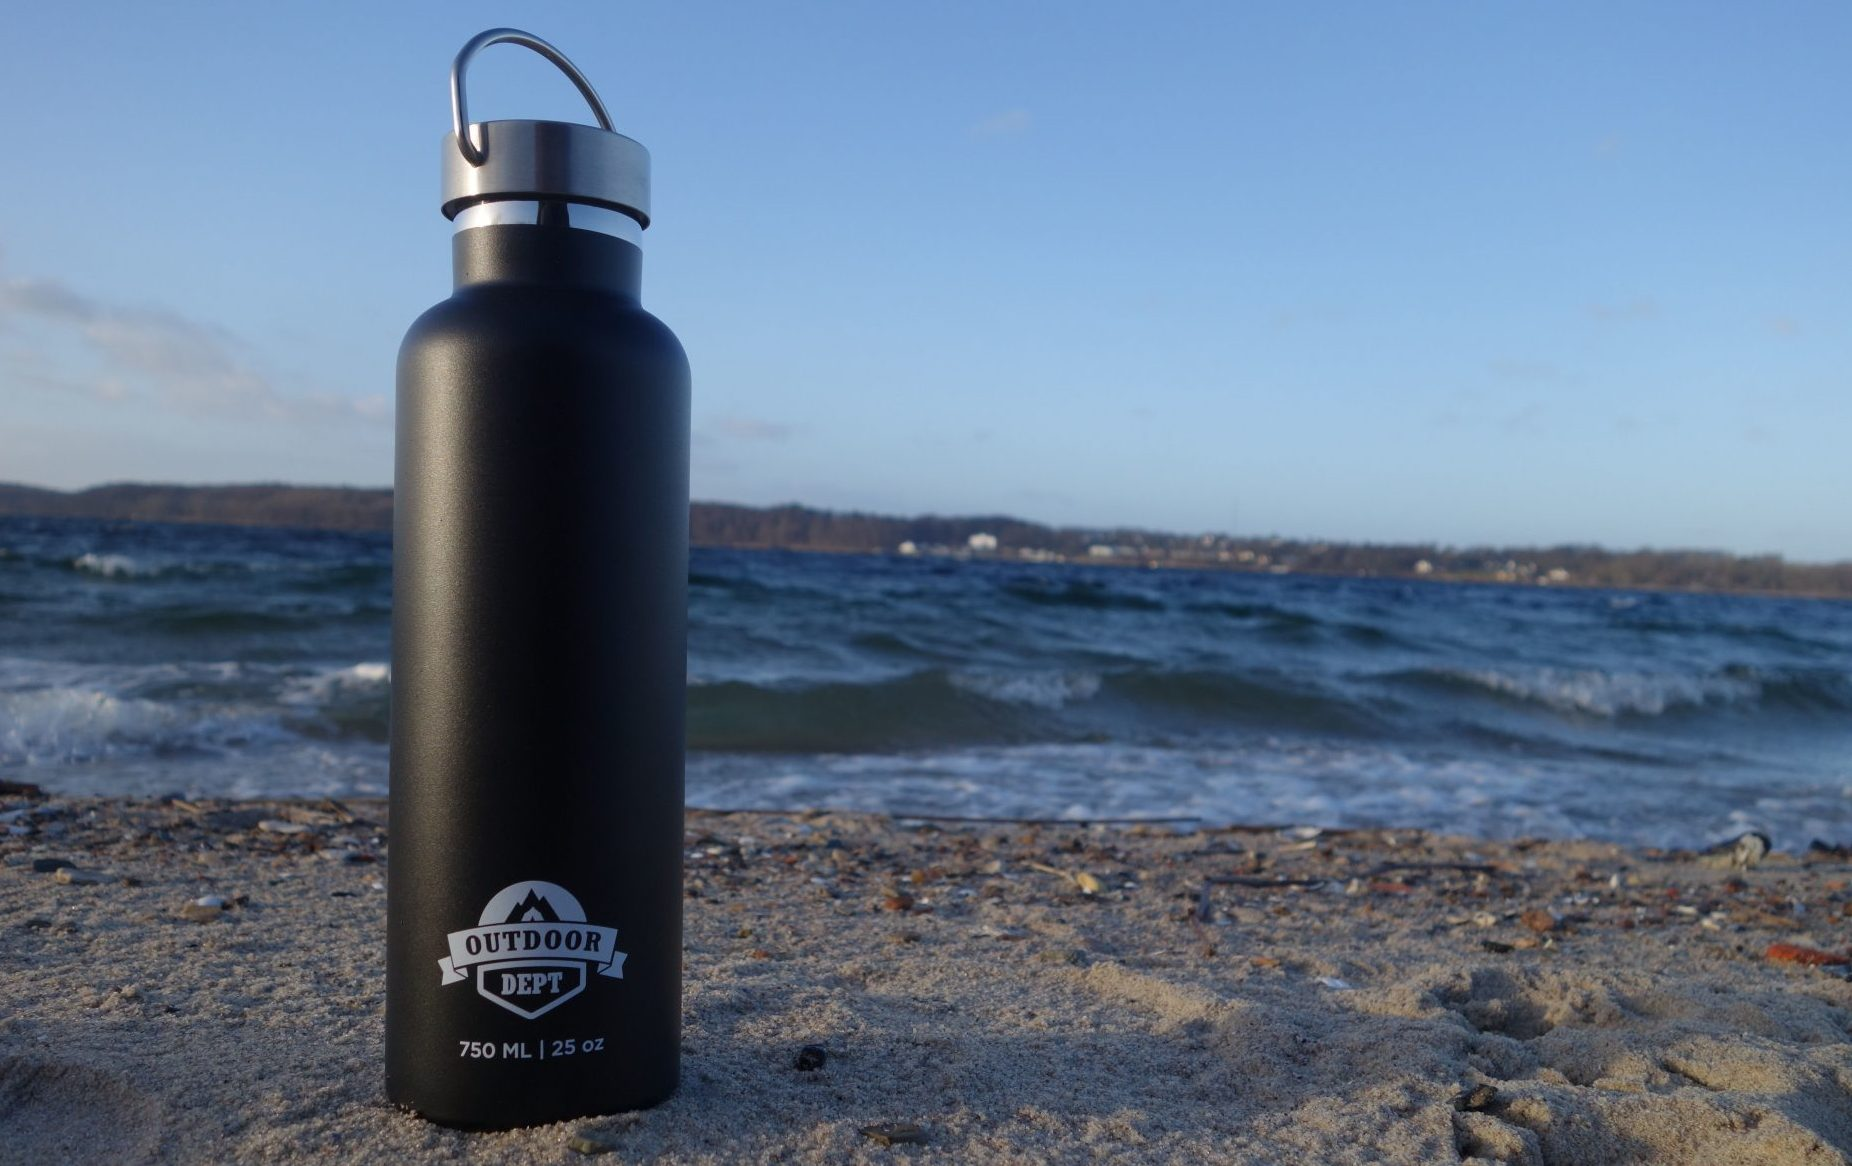 Outdoor DEPT Trinflasche Strand